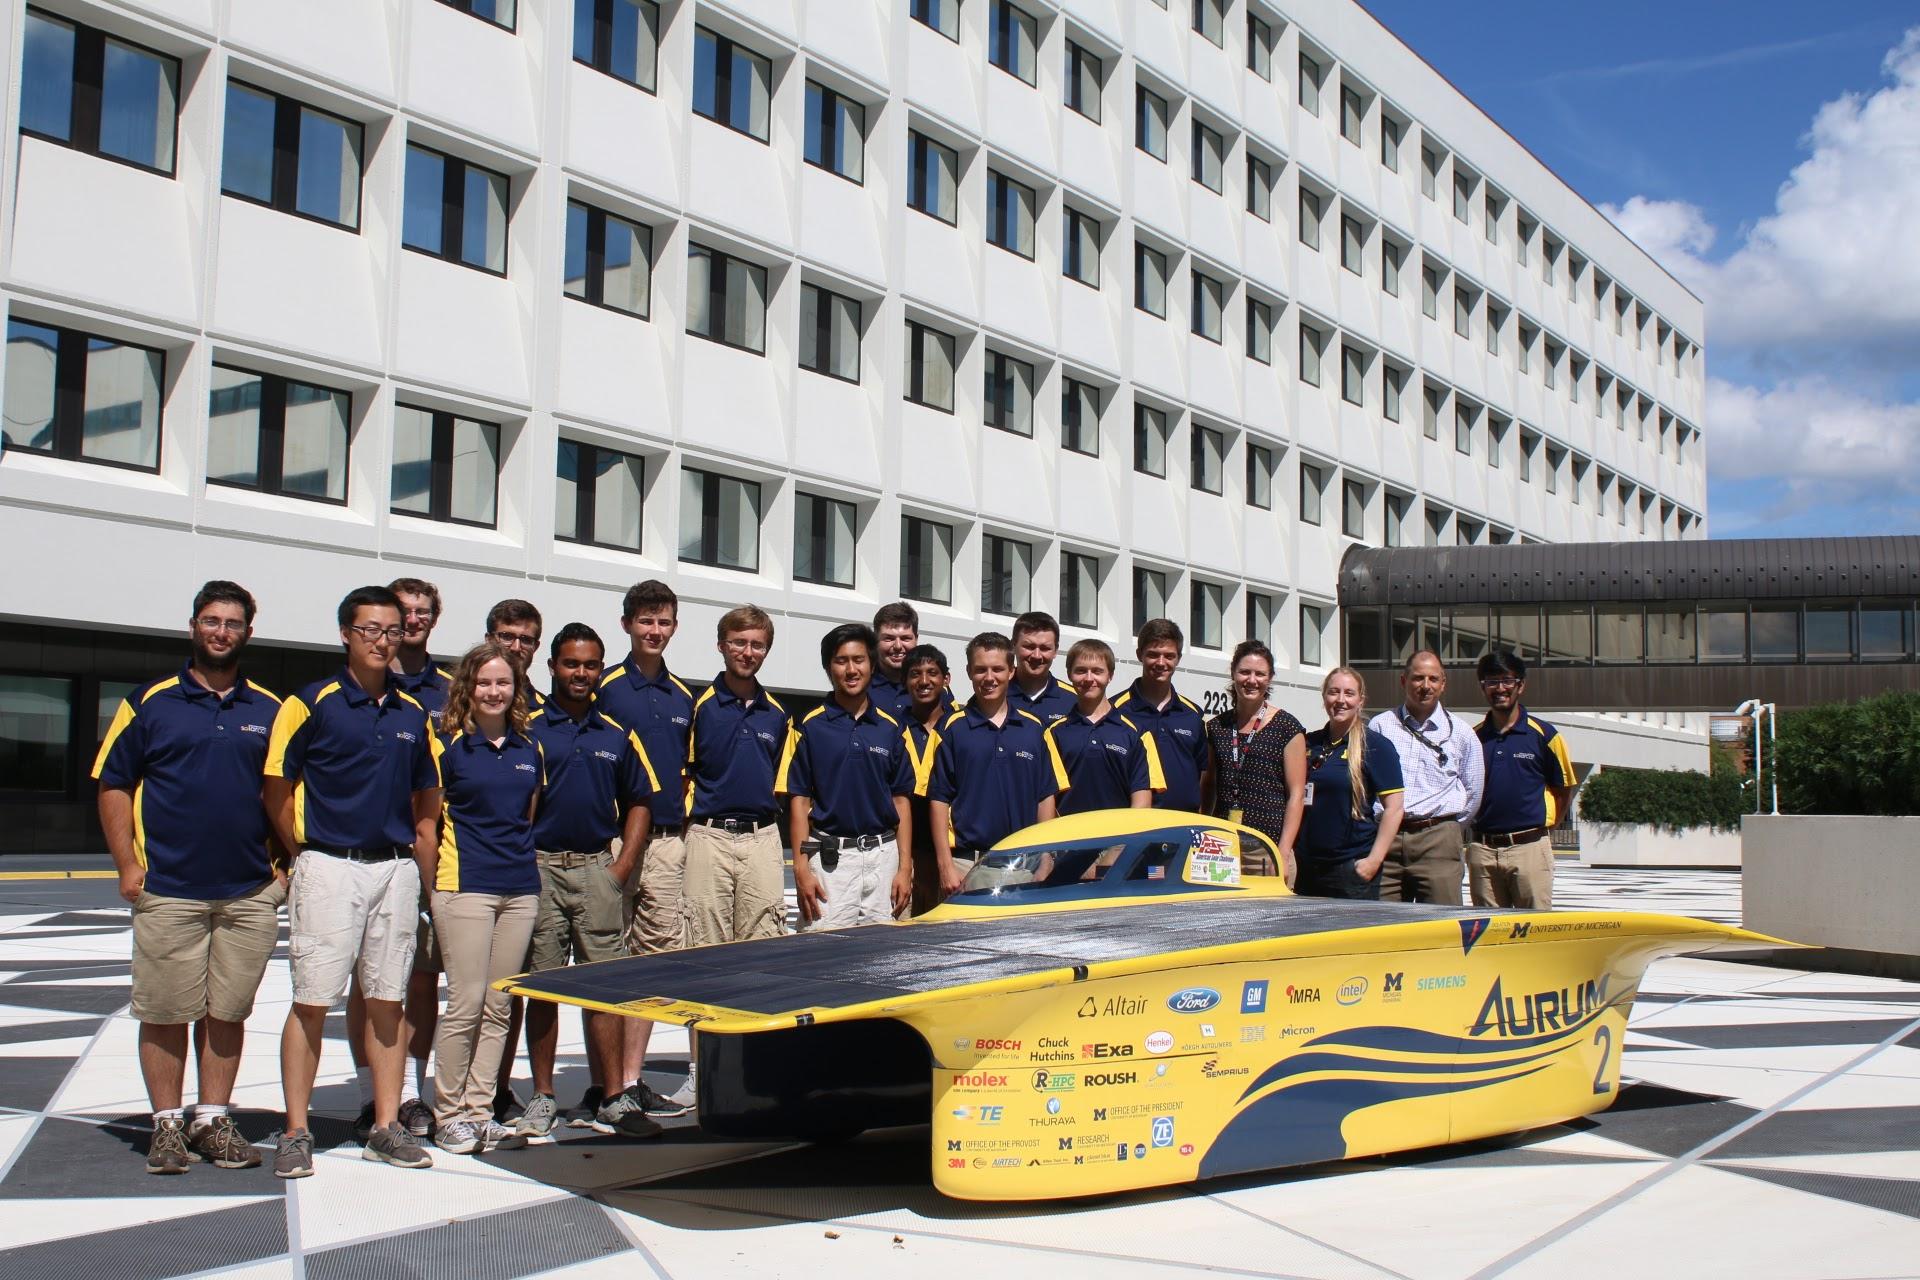 UM Solar's 2016 ASC Race Crew at 3M headquarters in St. Paul, Minnesota.